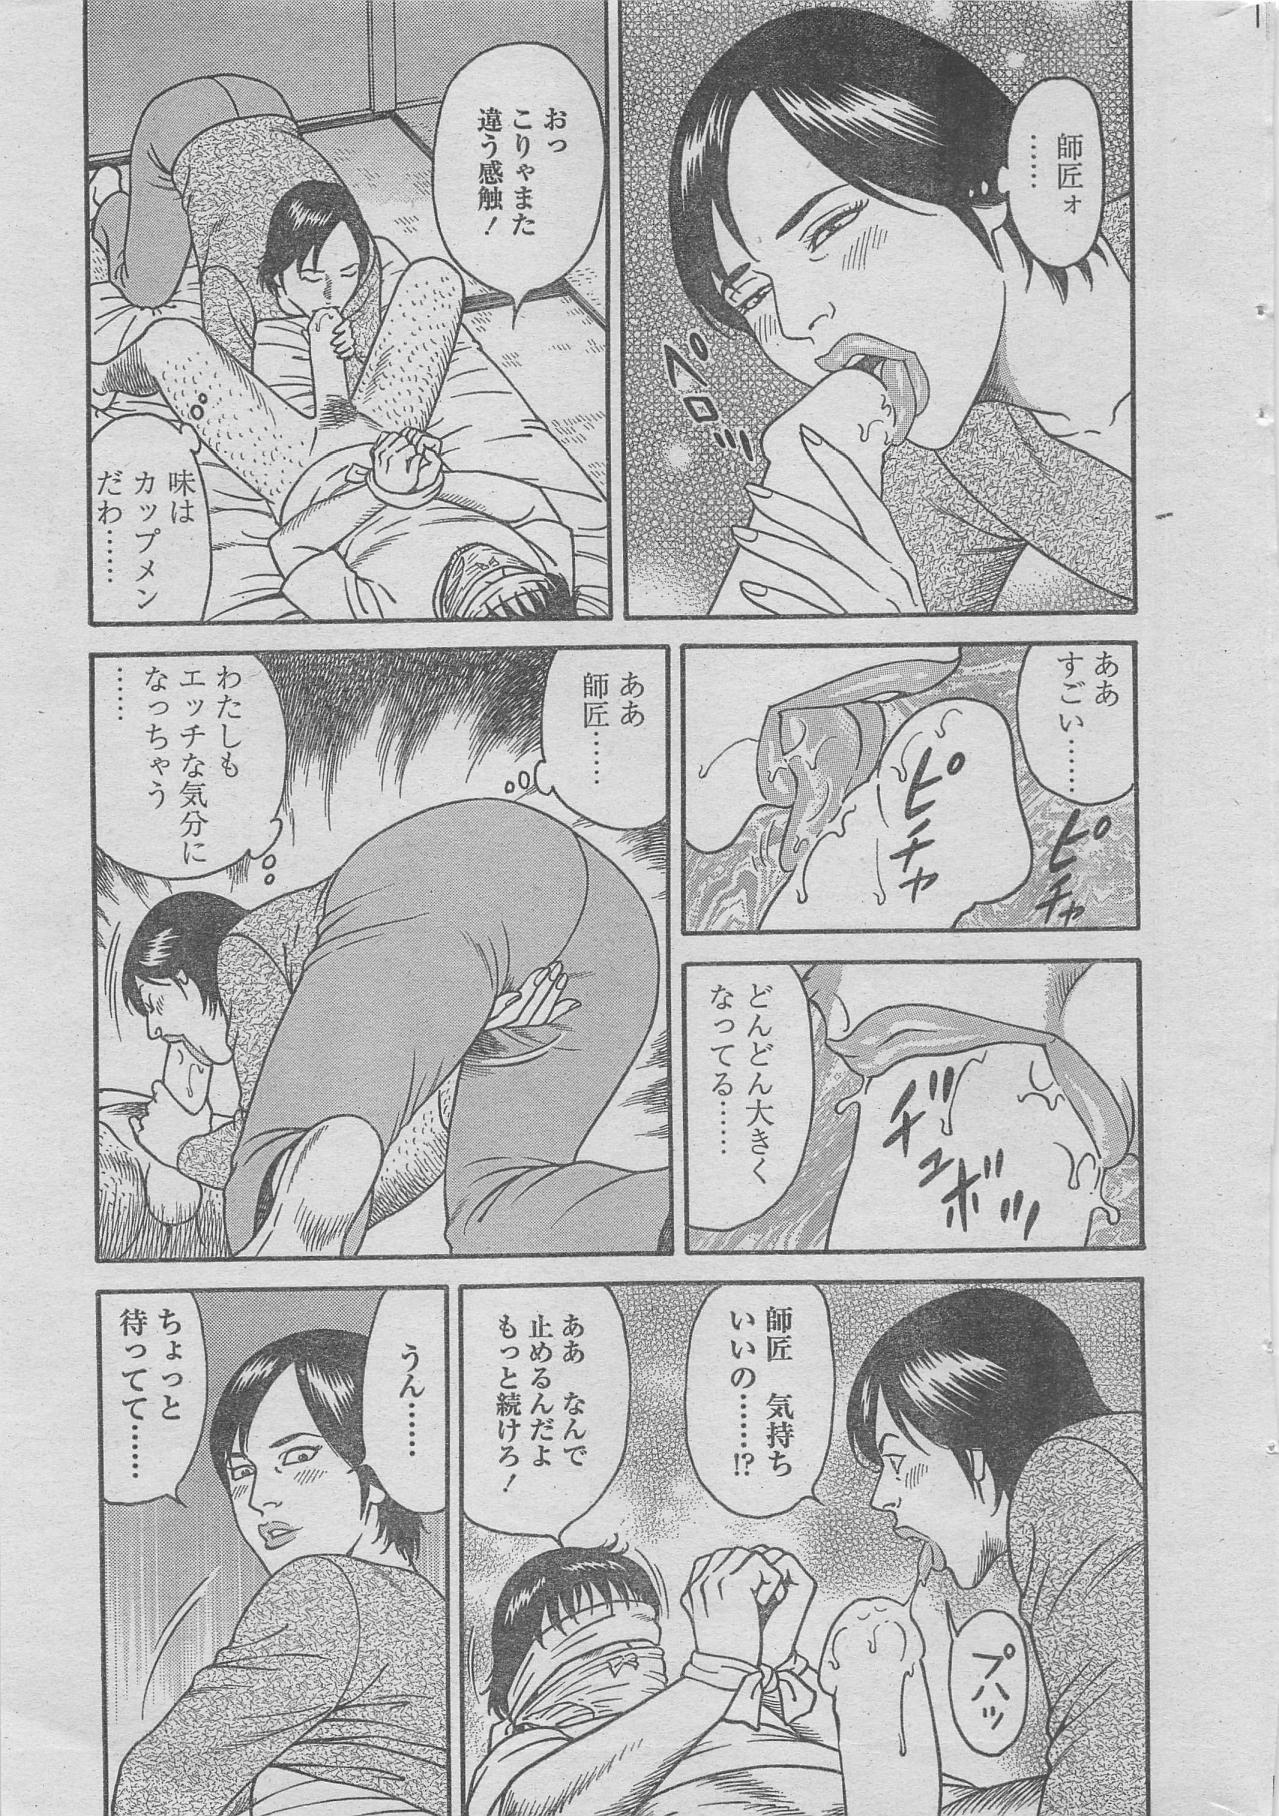 Manga Lawrence 2013-04 18